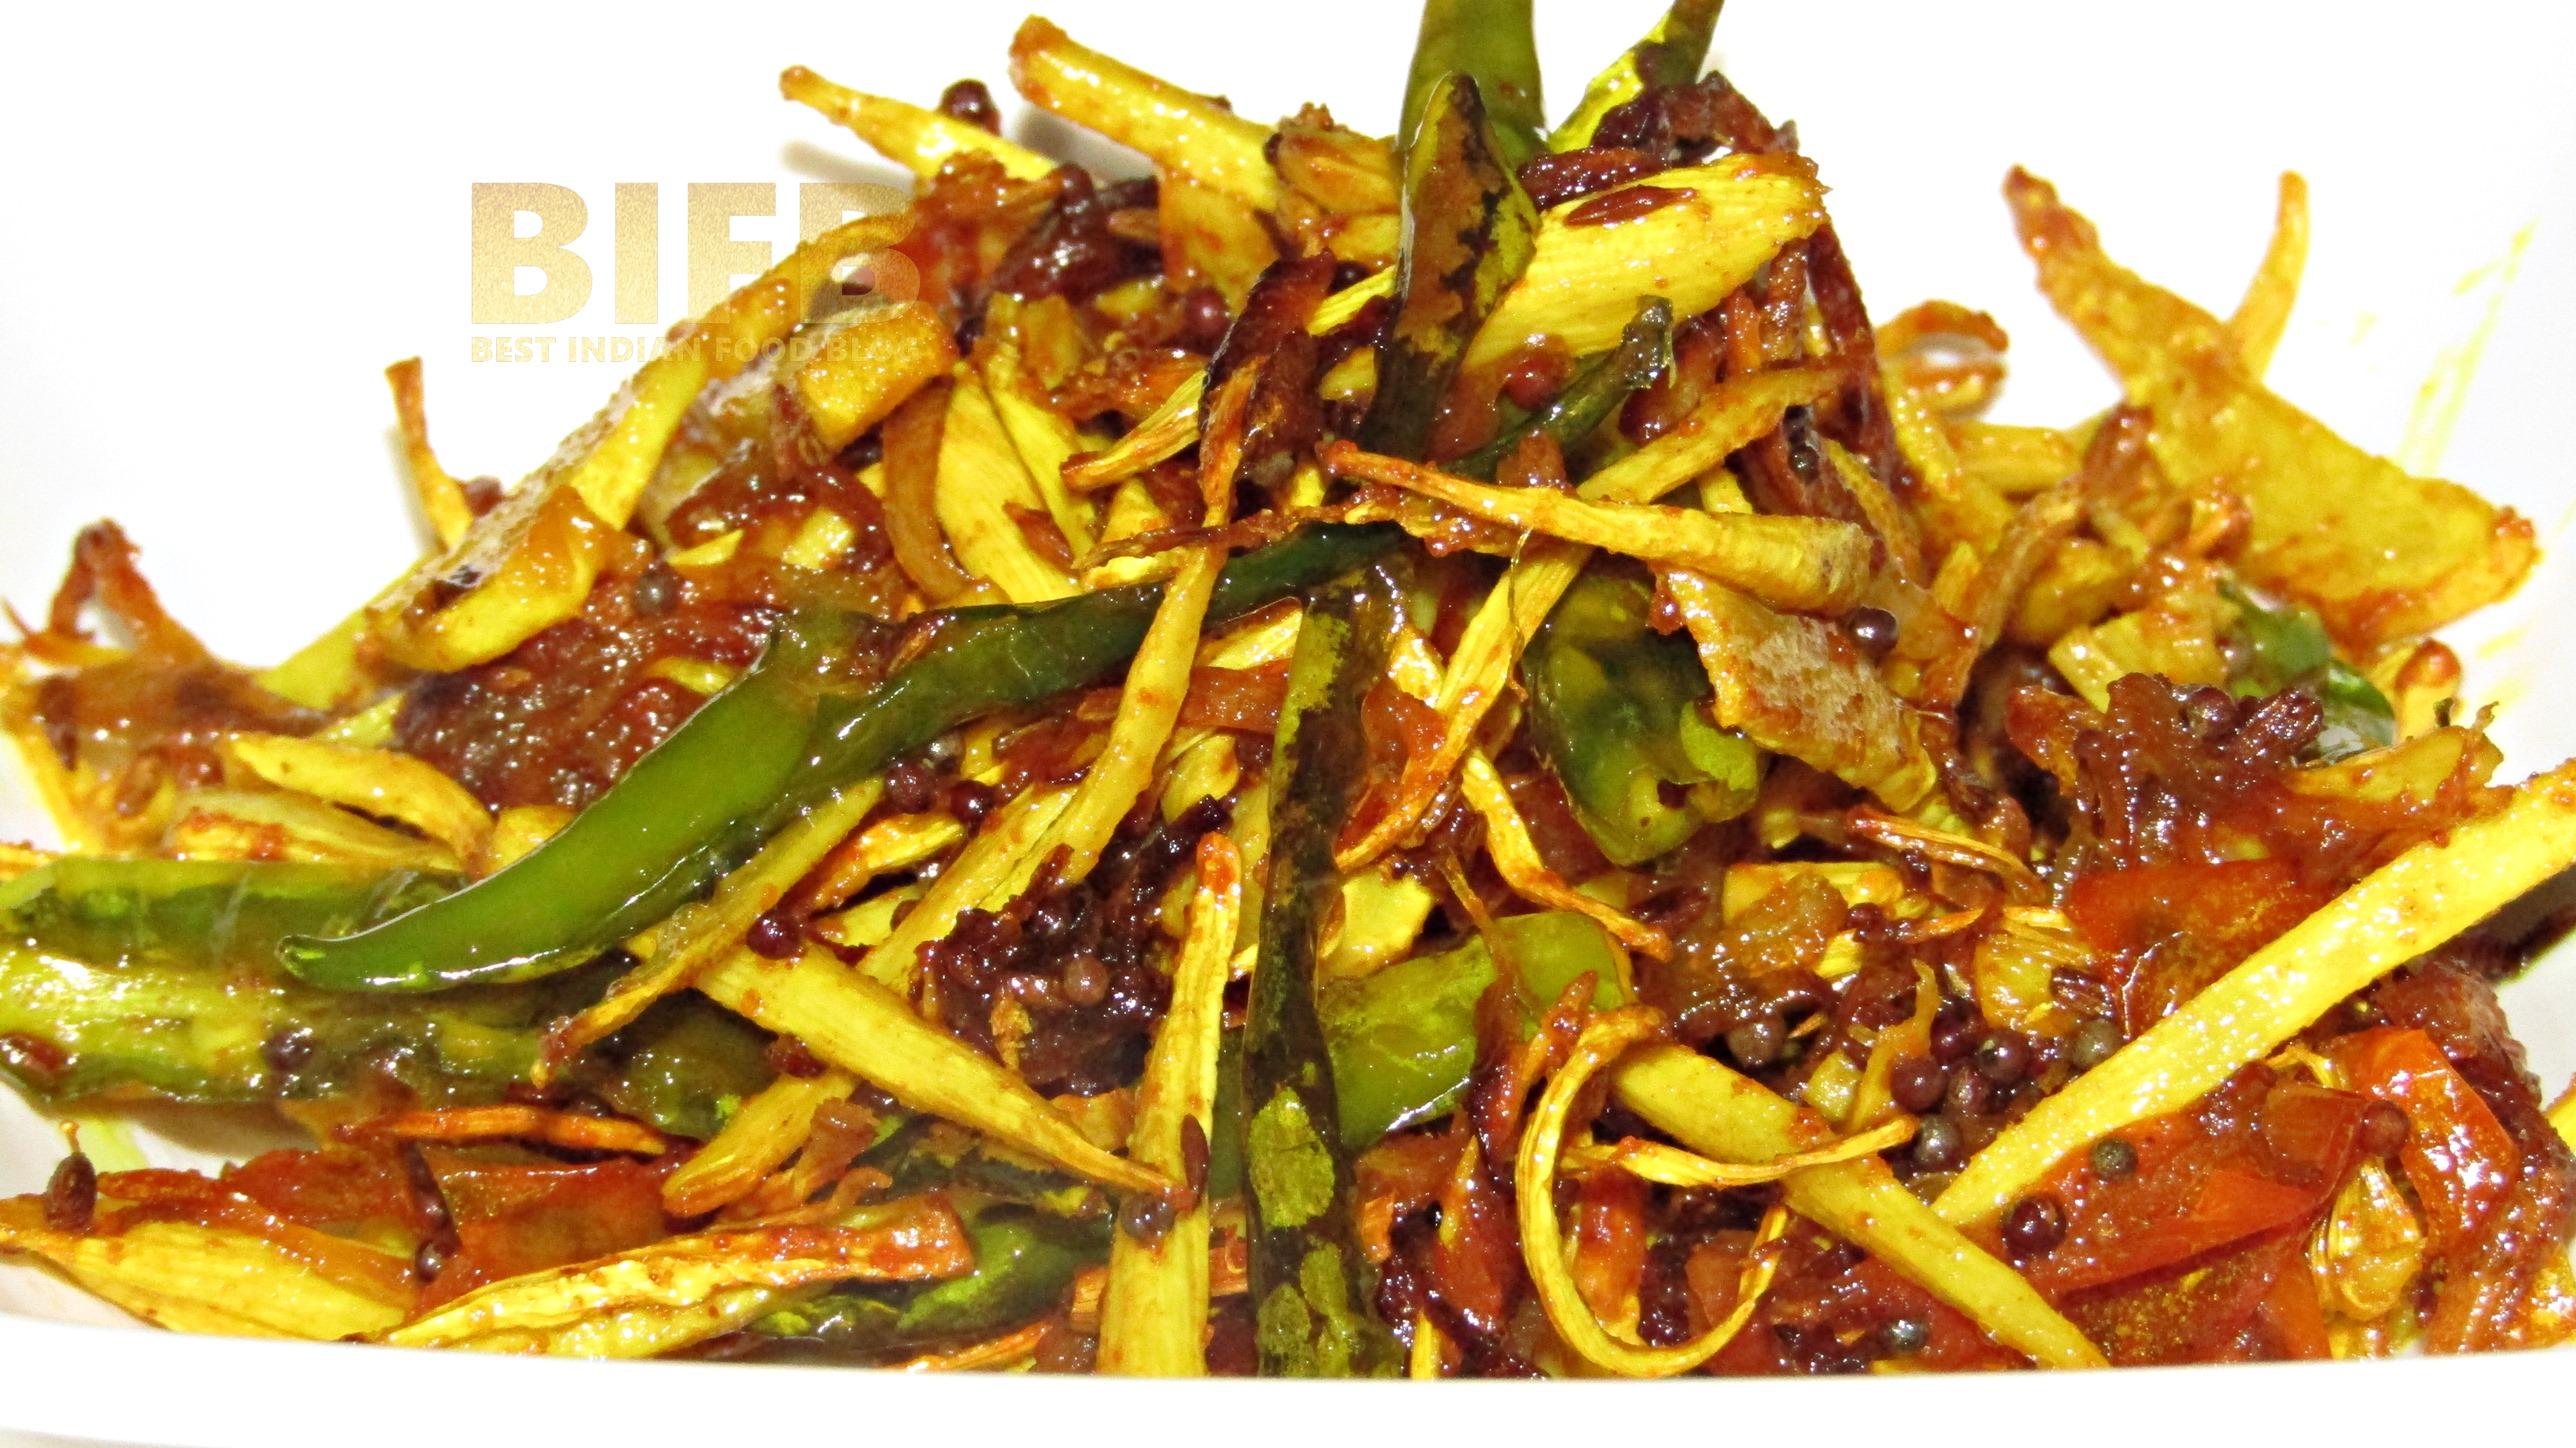 Karadi Bhaja Odisha, India | Best Indian Food Blog | Bamboo Shoot recipe